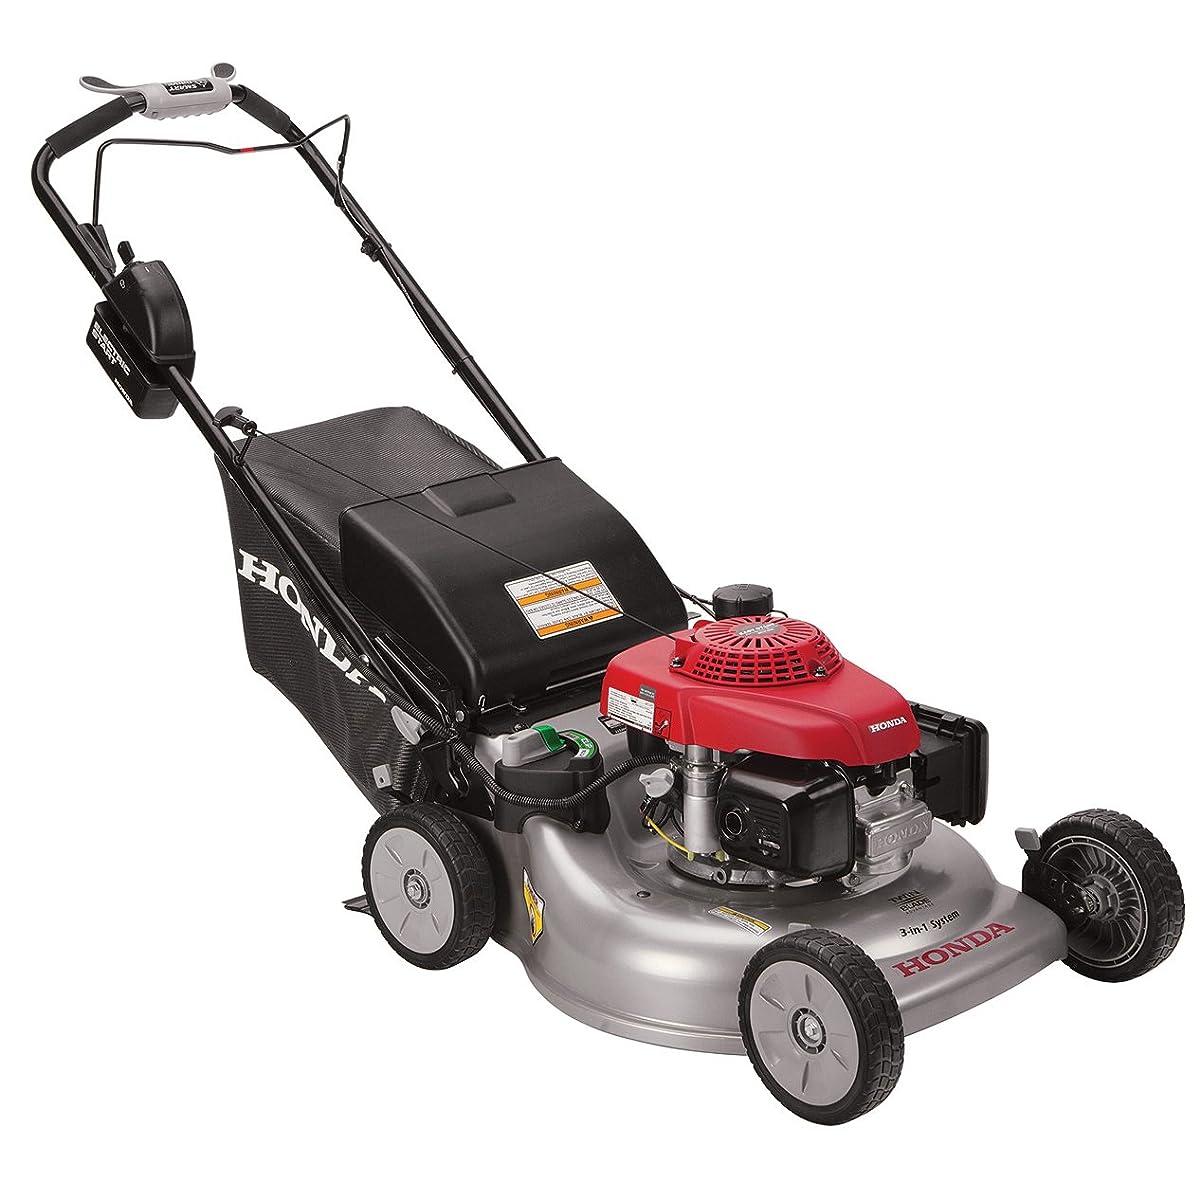 Honda 213-in-1 Self Propelled Self Charging Electric Start Lawn Mower